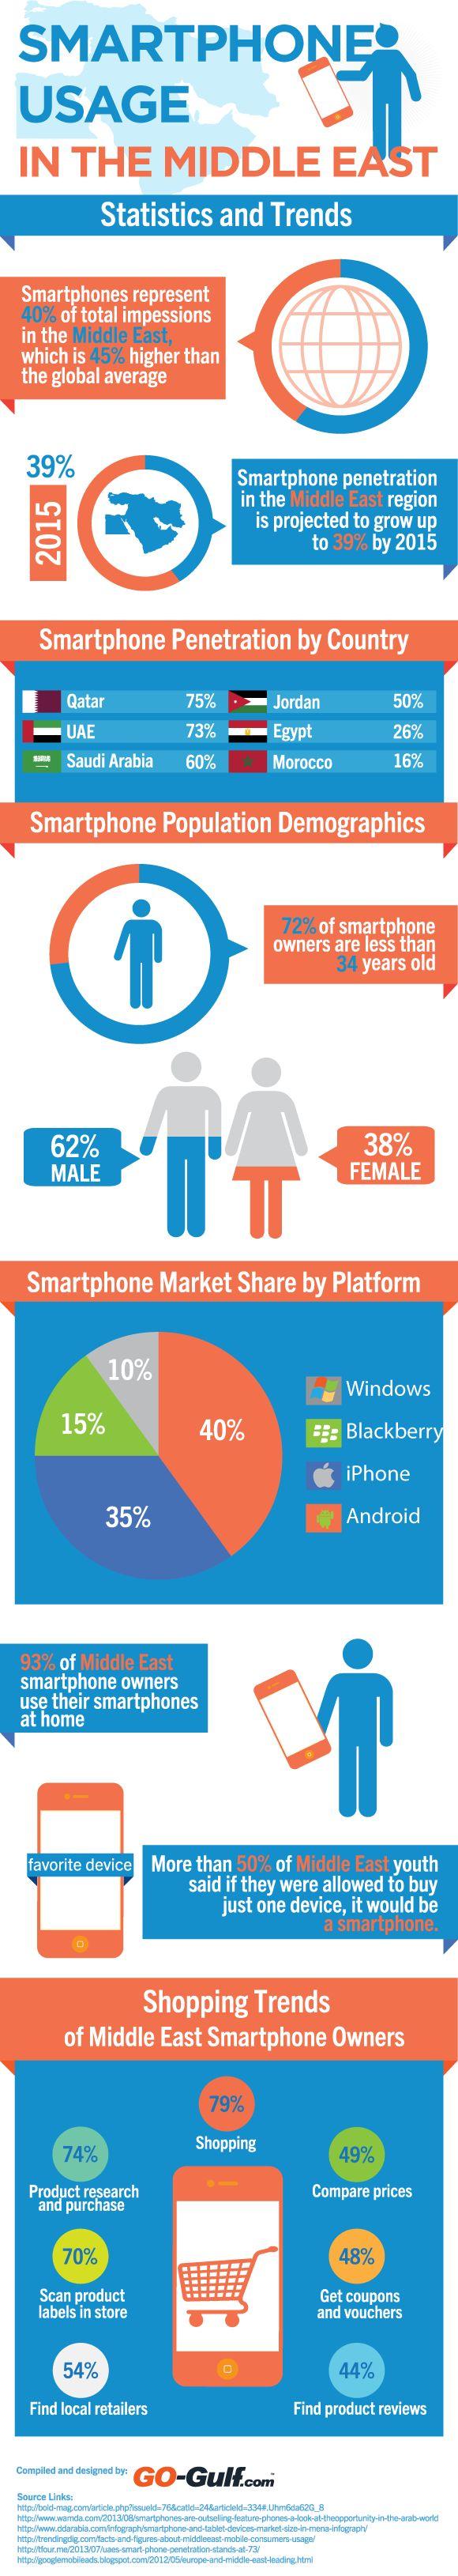 Middle East Smartphone Usage Trends {Go-Gulf.com}